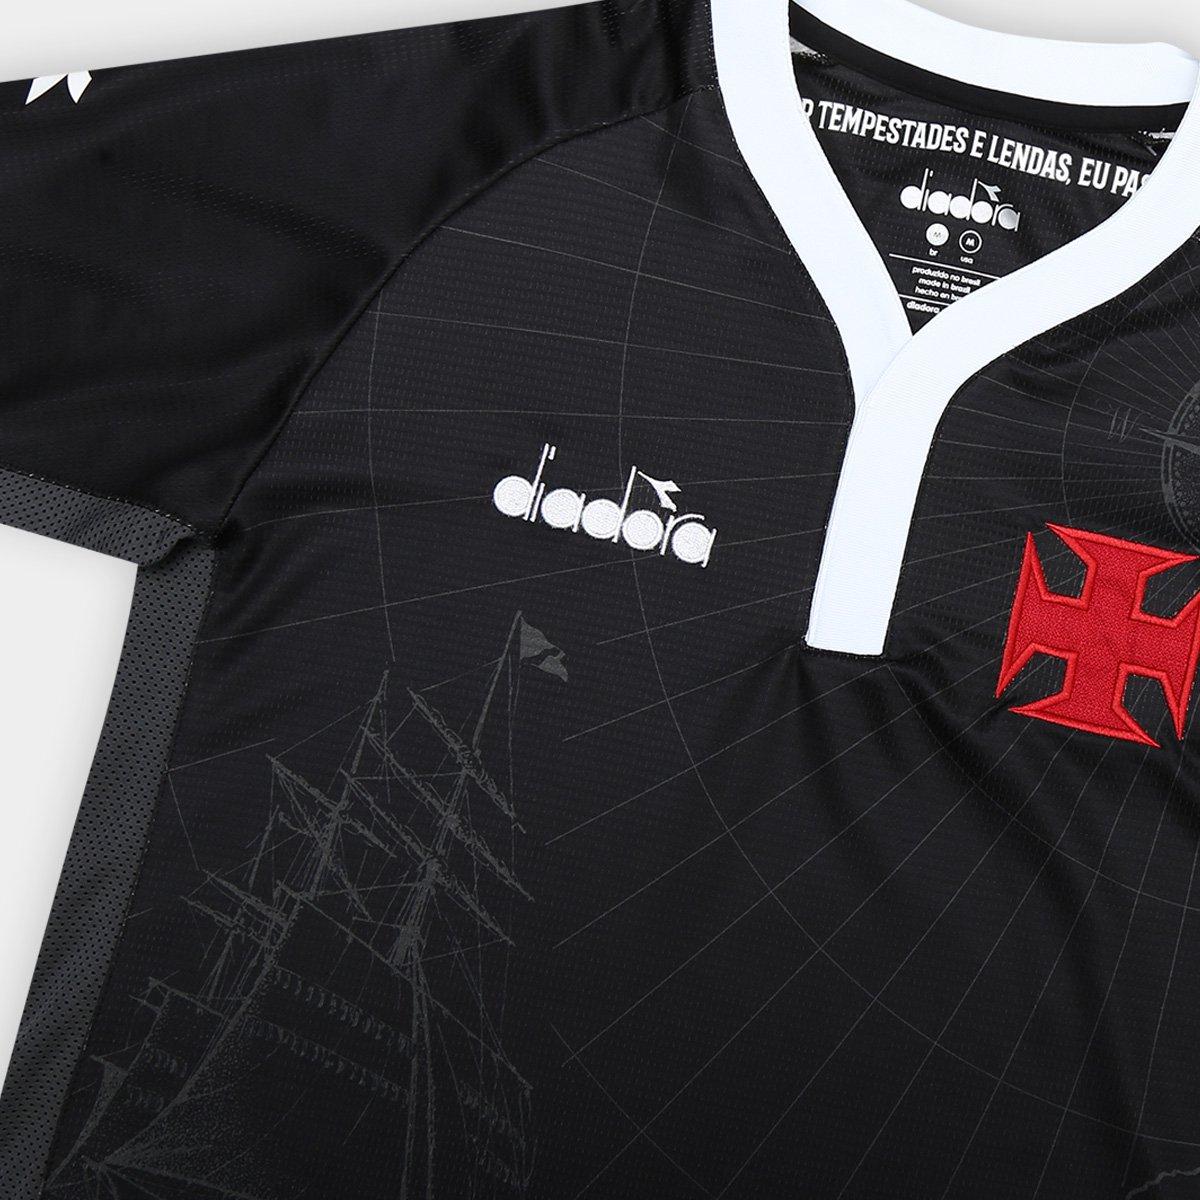 Camisa Vasco III 2018 s n° - Torcedor Diadora Masculina - Preto ... 2e36ef97e07cb